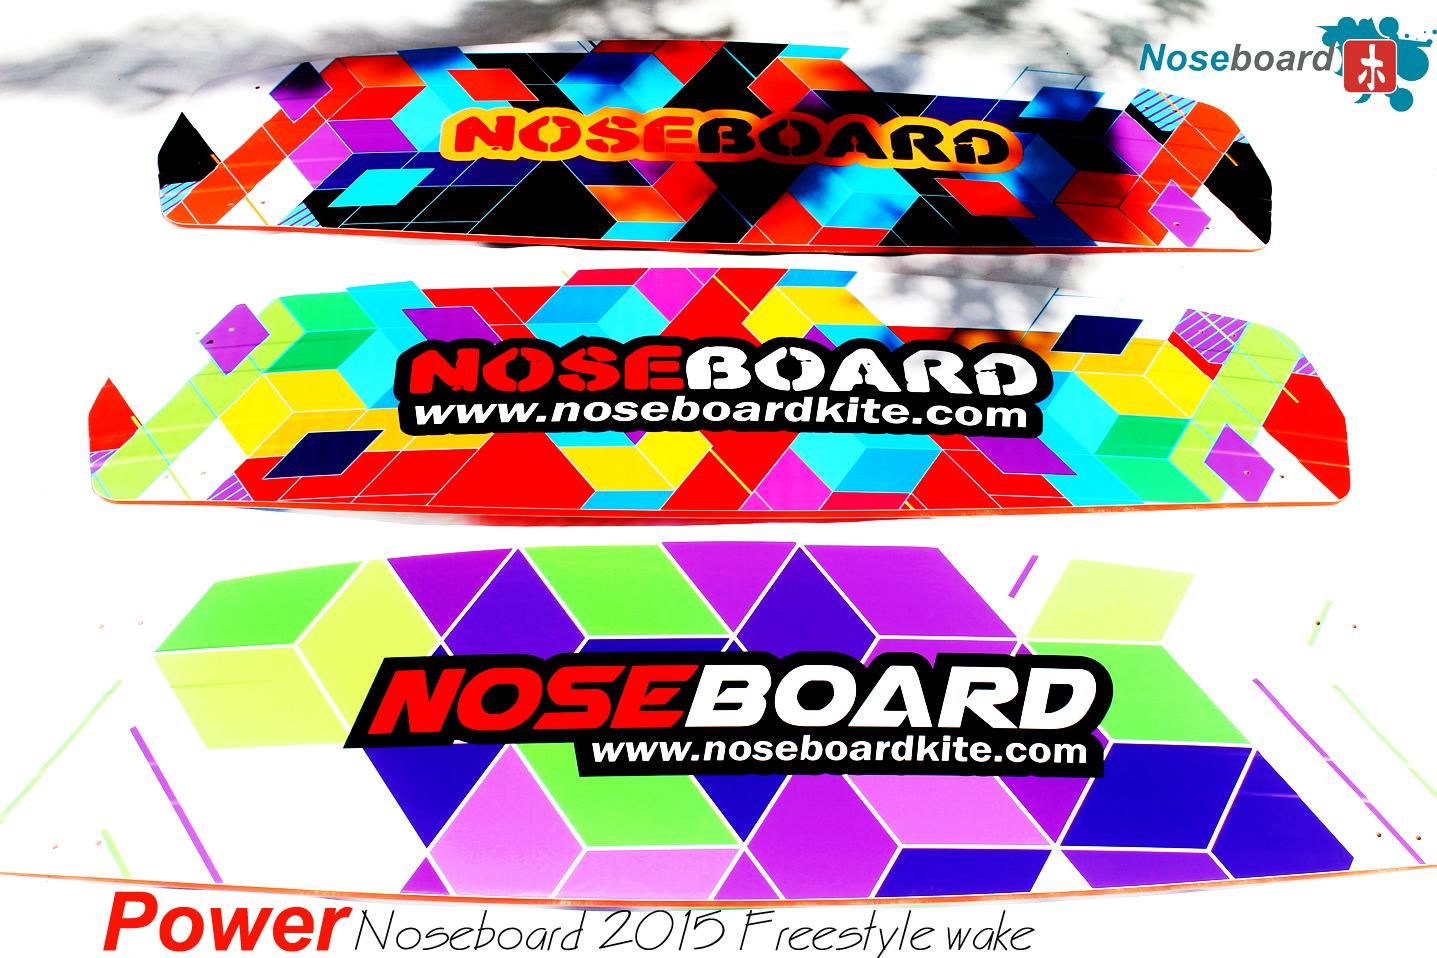 Kitesurf Noseboard Tablas KITE surf SUP Surf -Fabricante